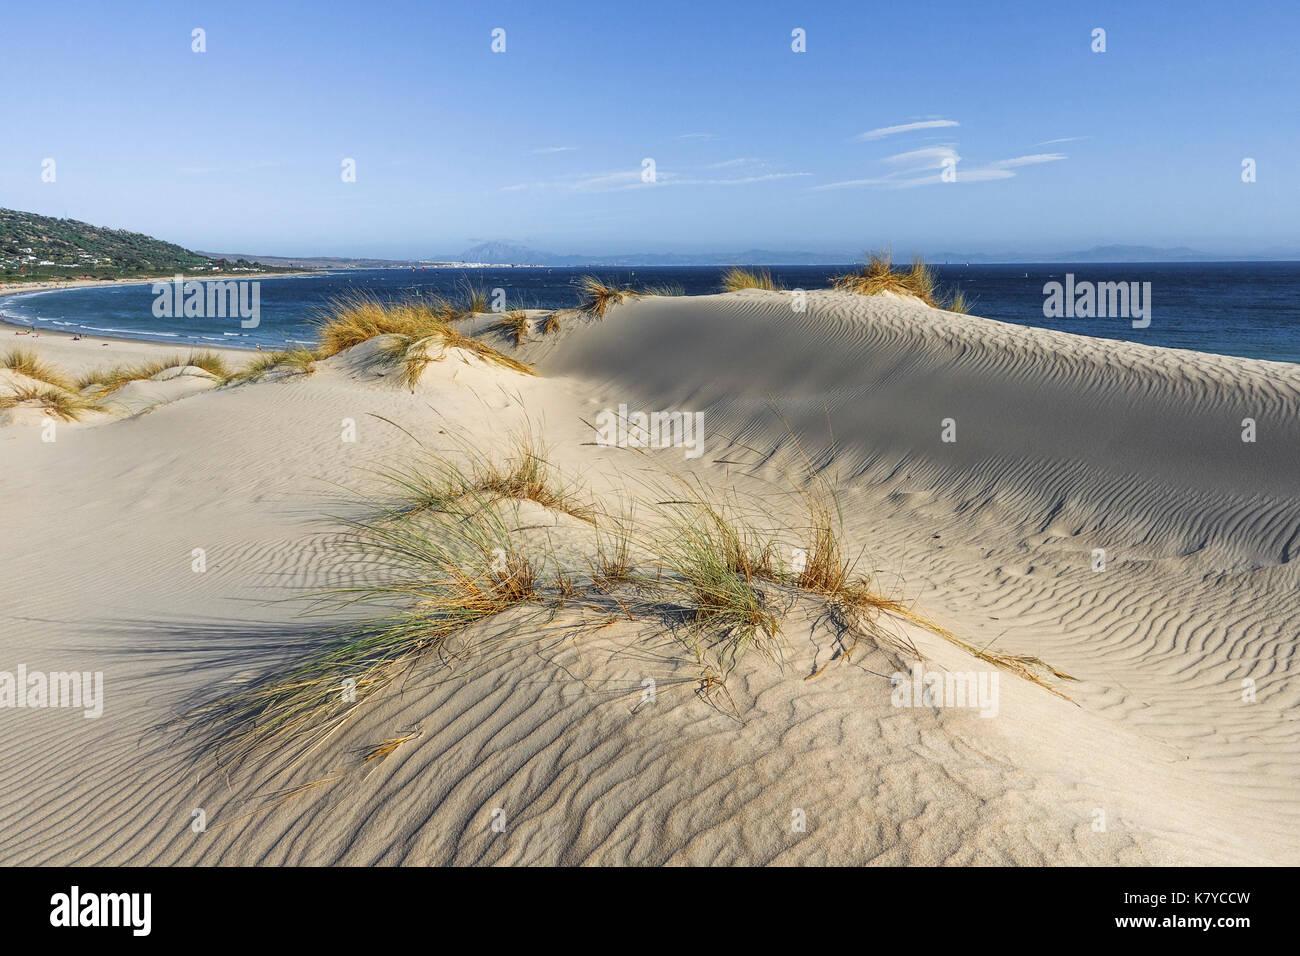 dunes-sand-dune-of-punta-paloma-valdevaq